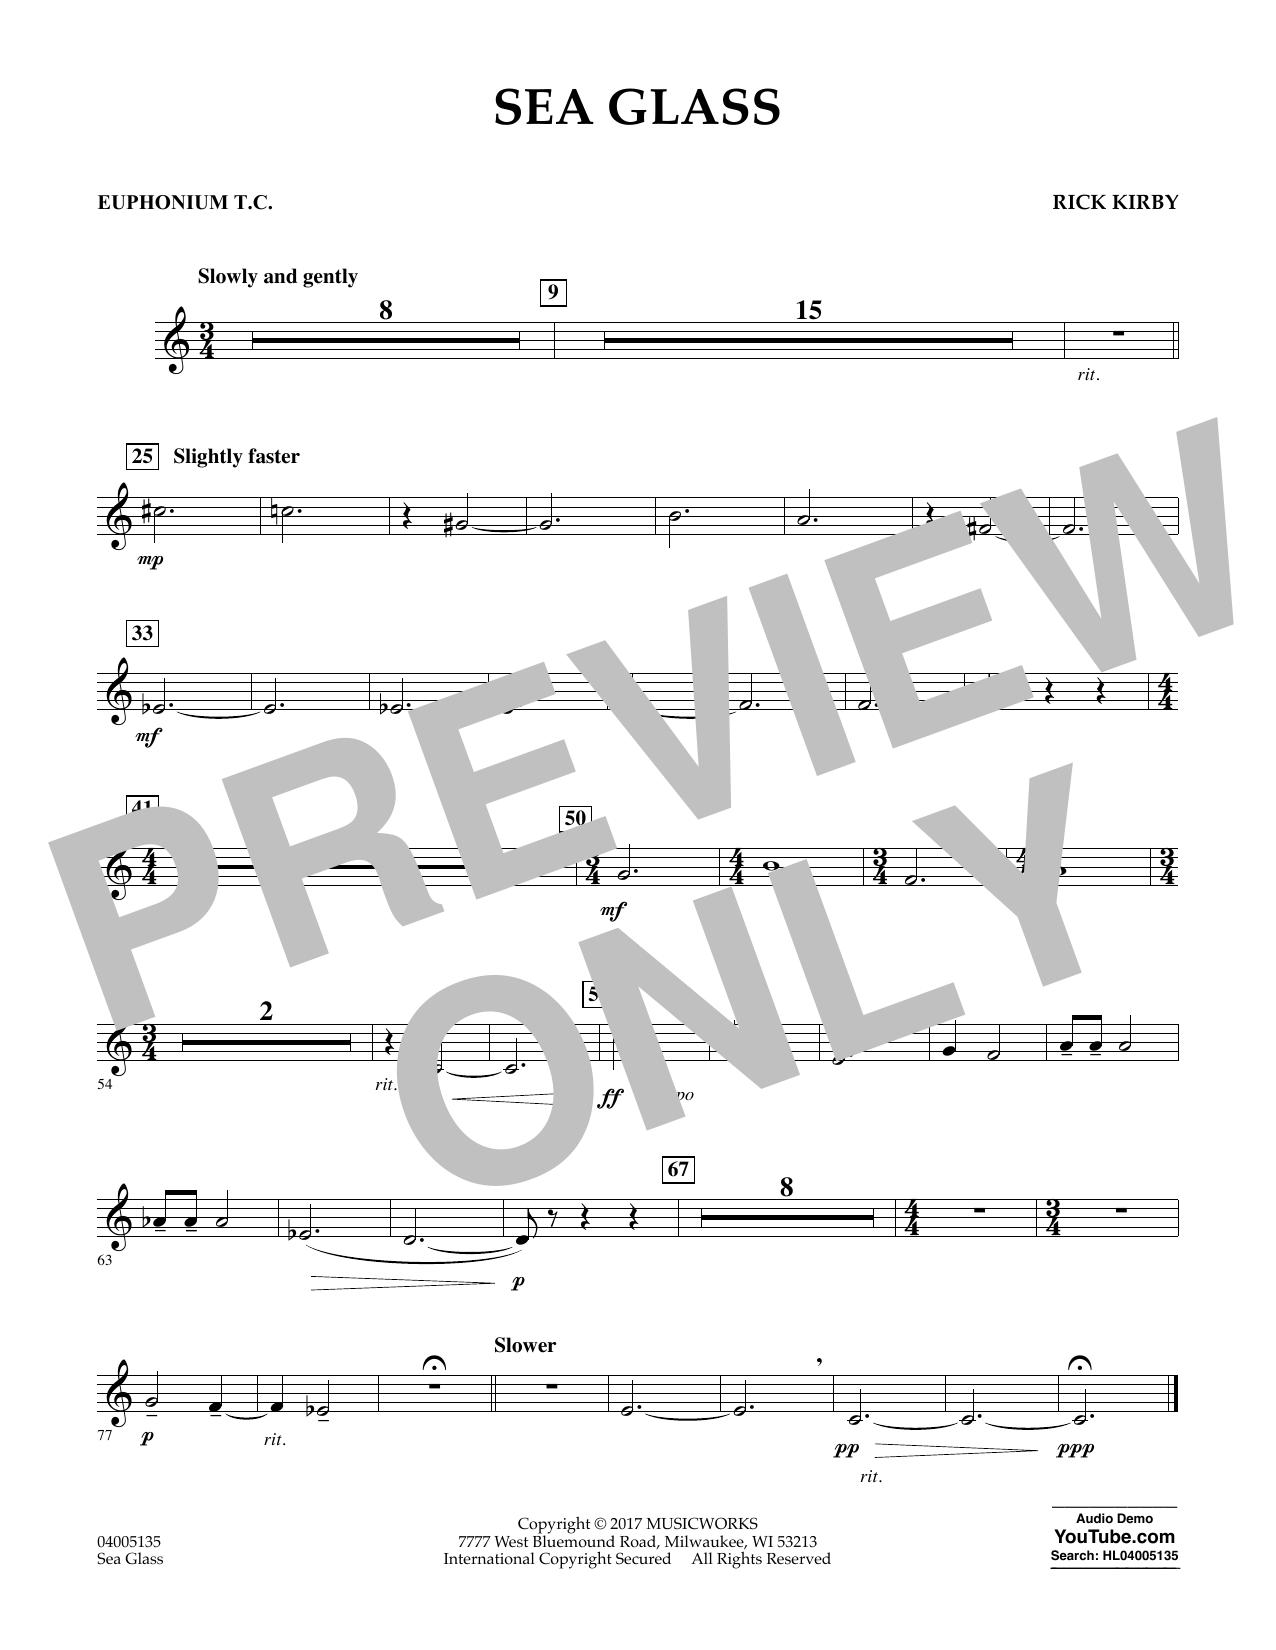 Sea Glass - Euphonium in Treble Clef (Concert Band)